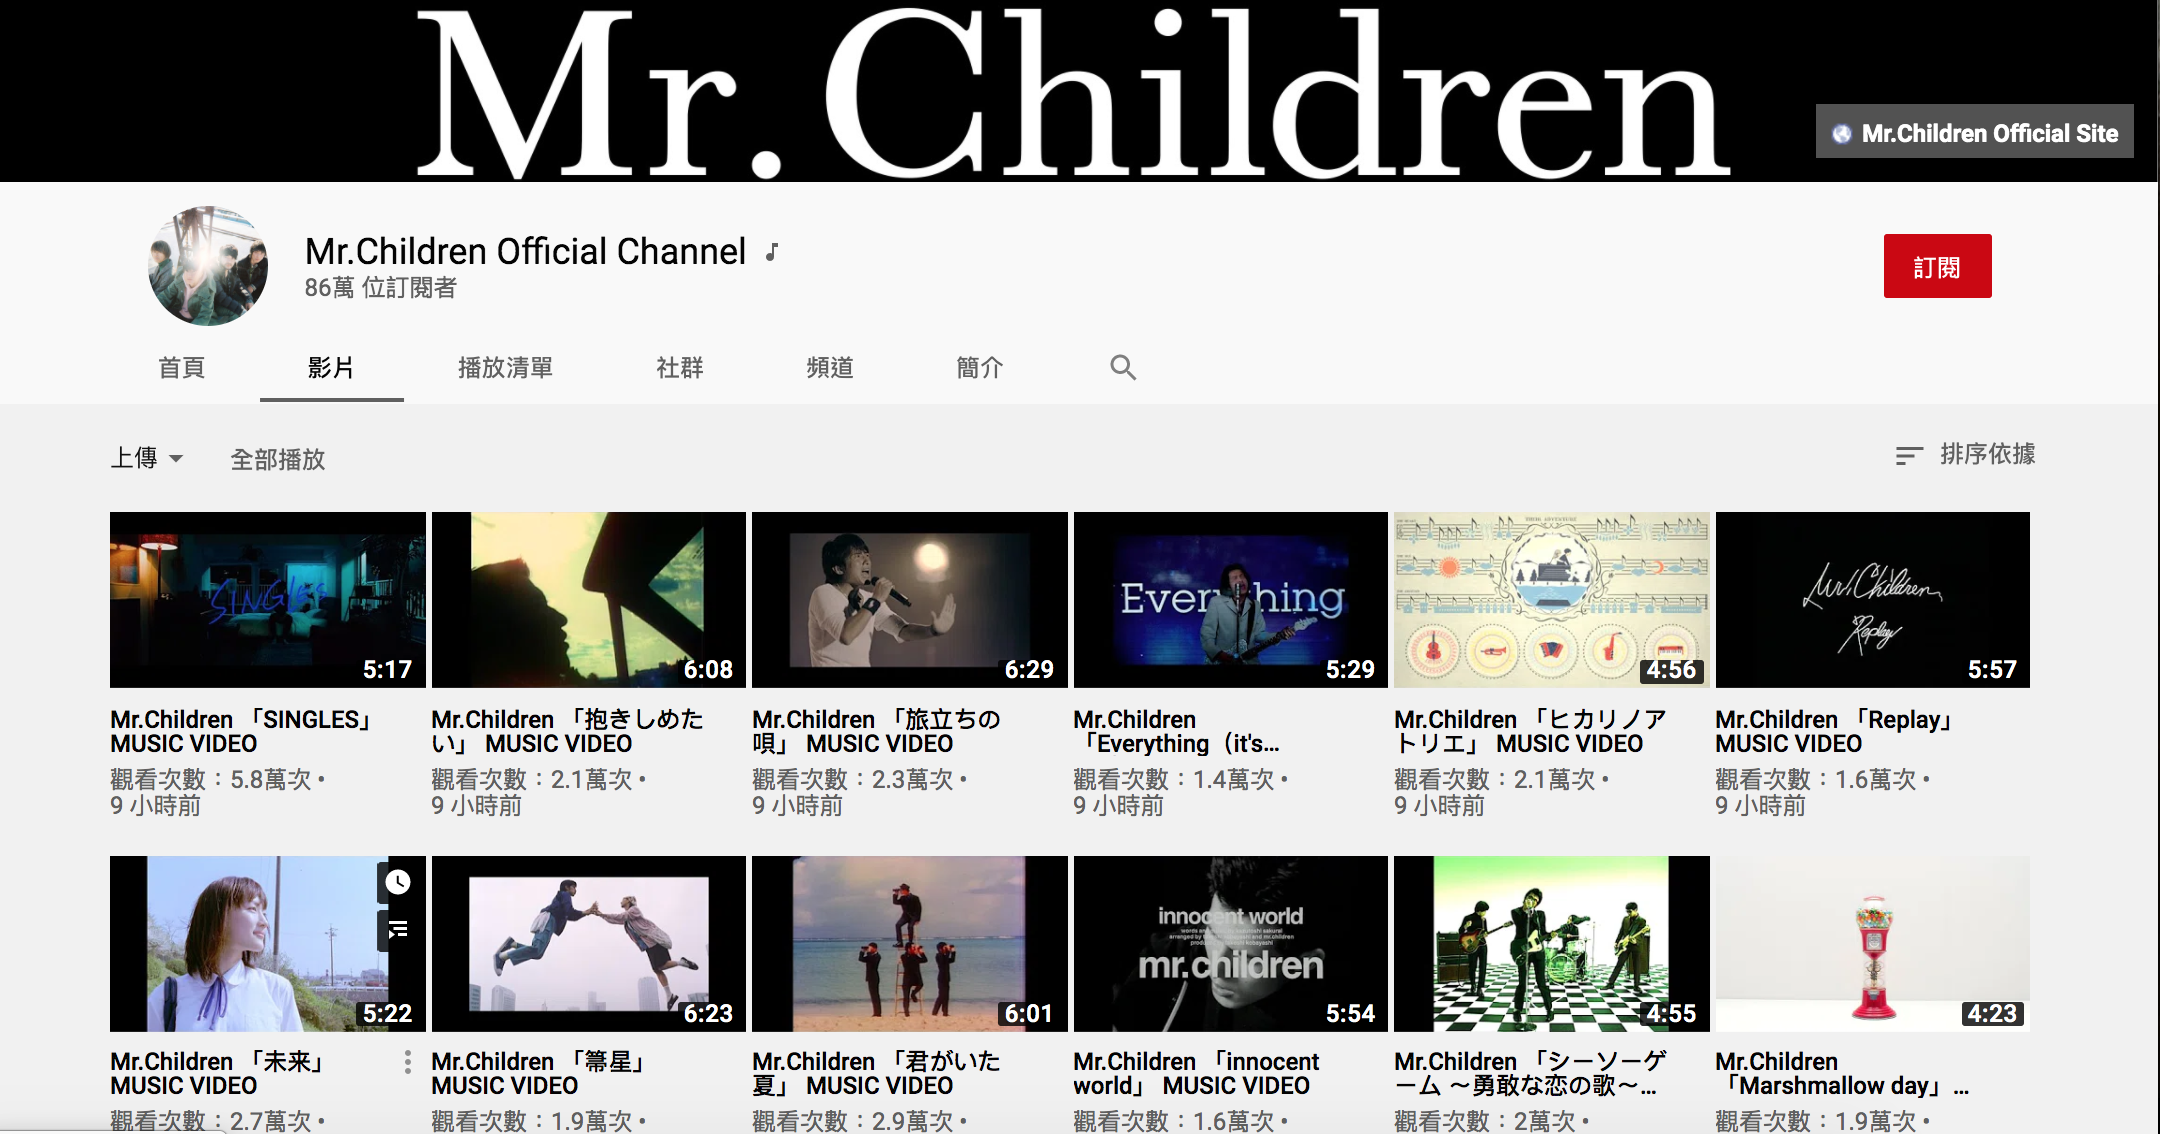 Mr.Children 20支MV YouTube驚喜上架 新曲〈others〉作為啤酒廣告曲